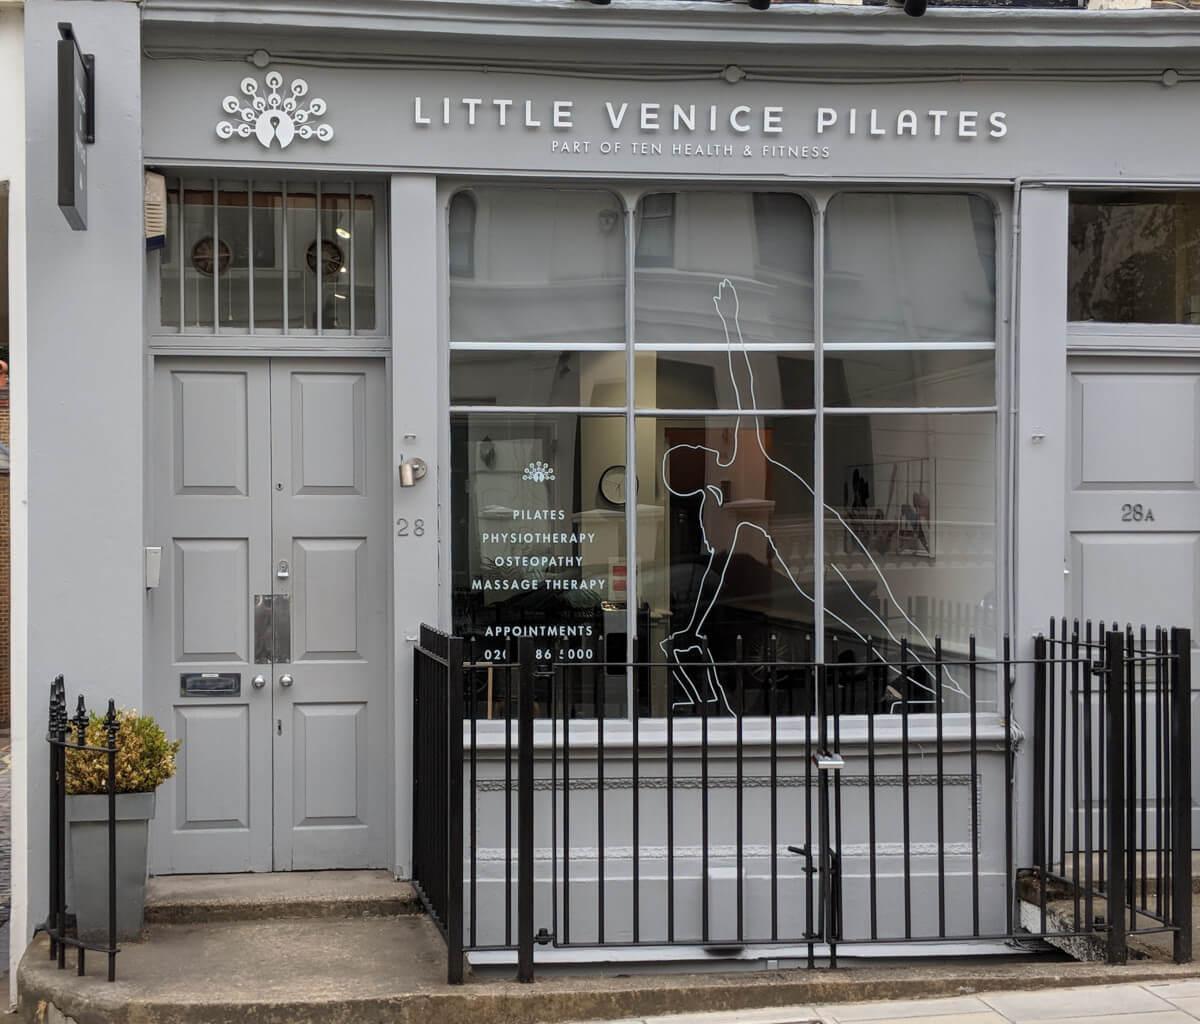 Little Venice Pilates